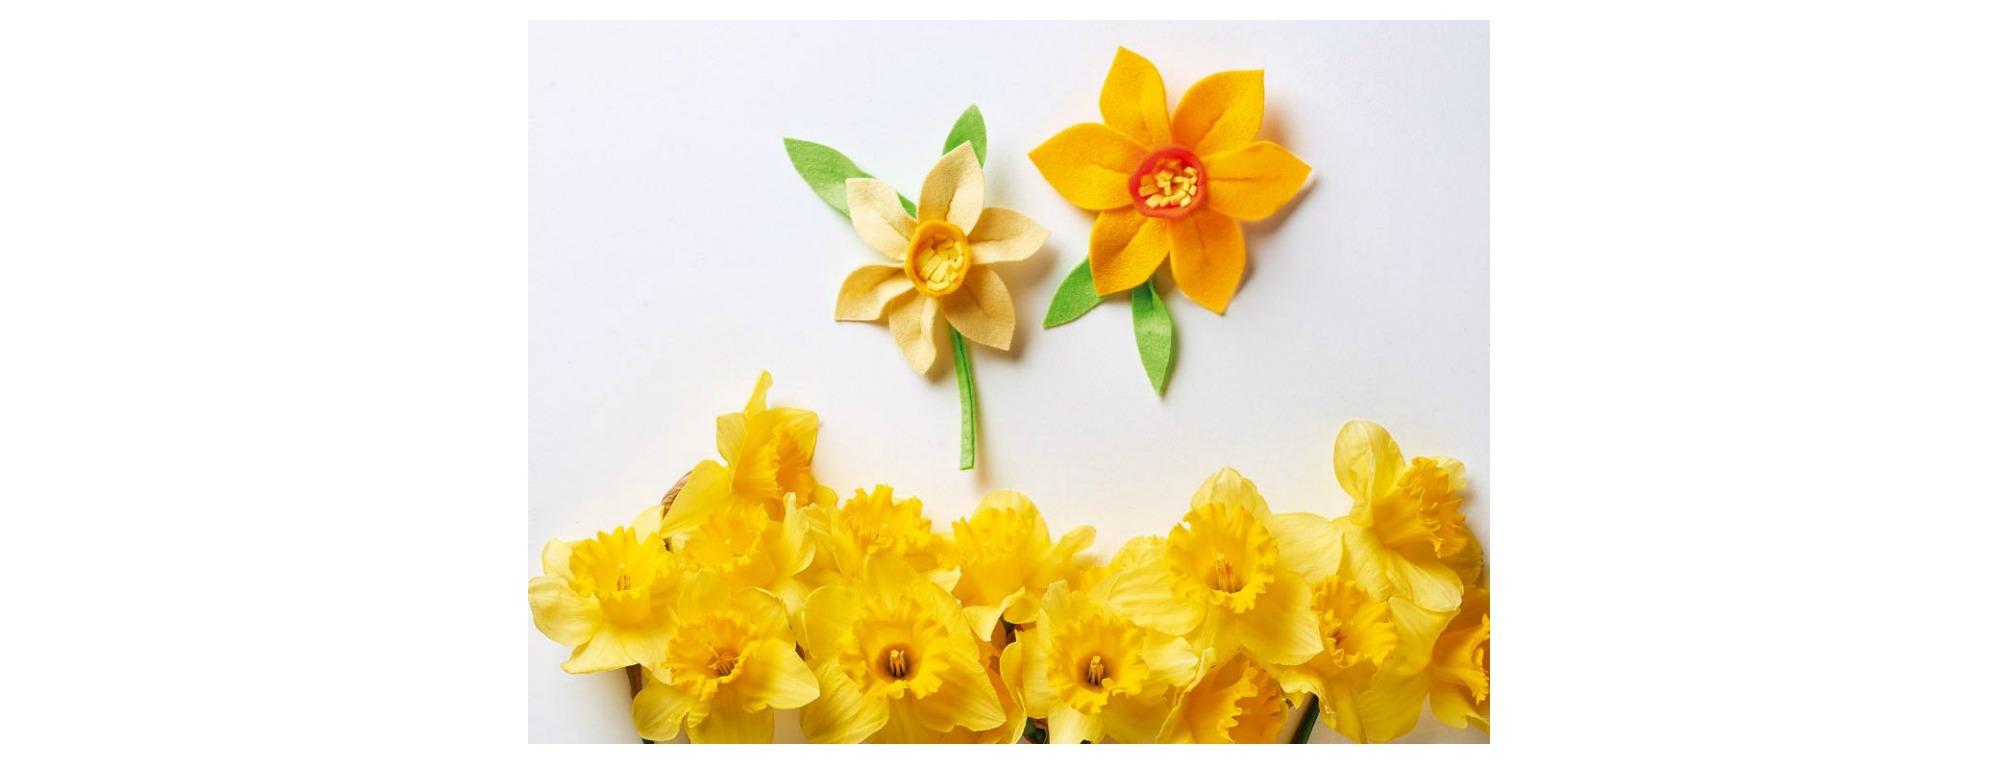 Daffodil project